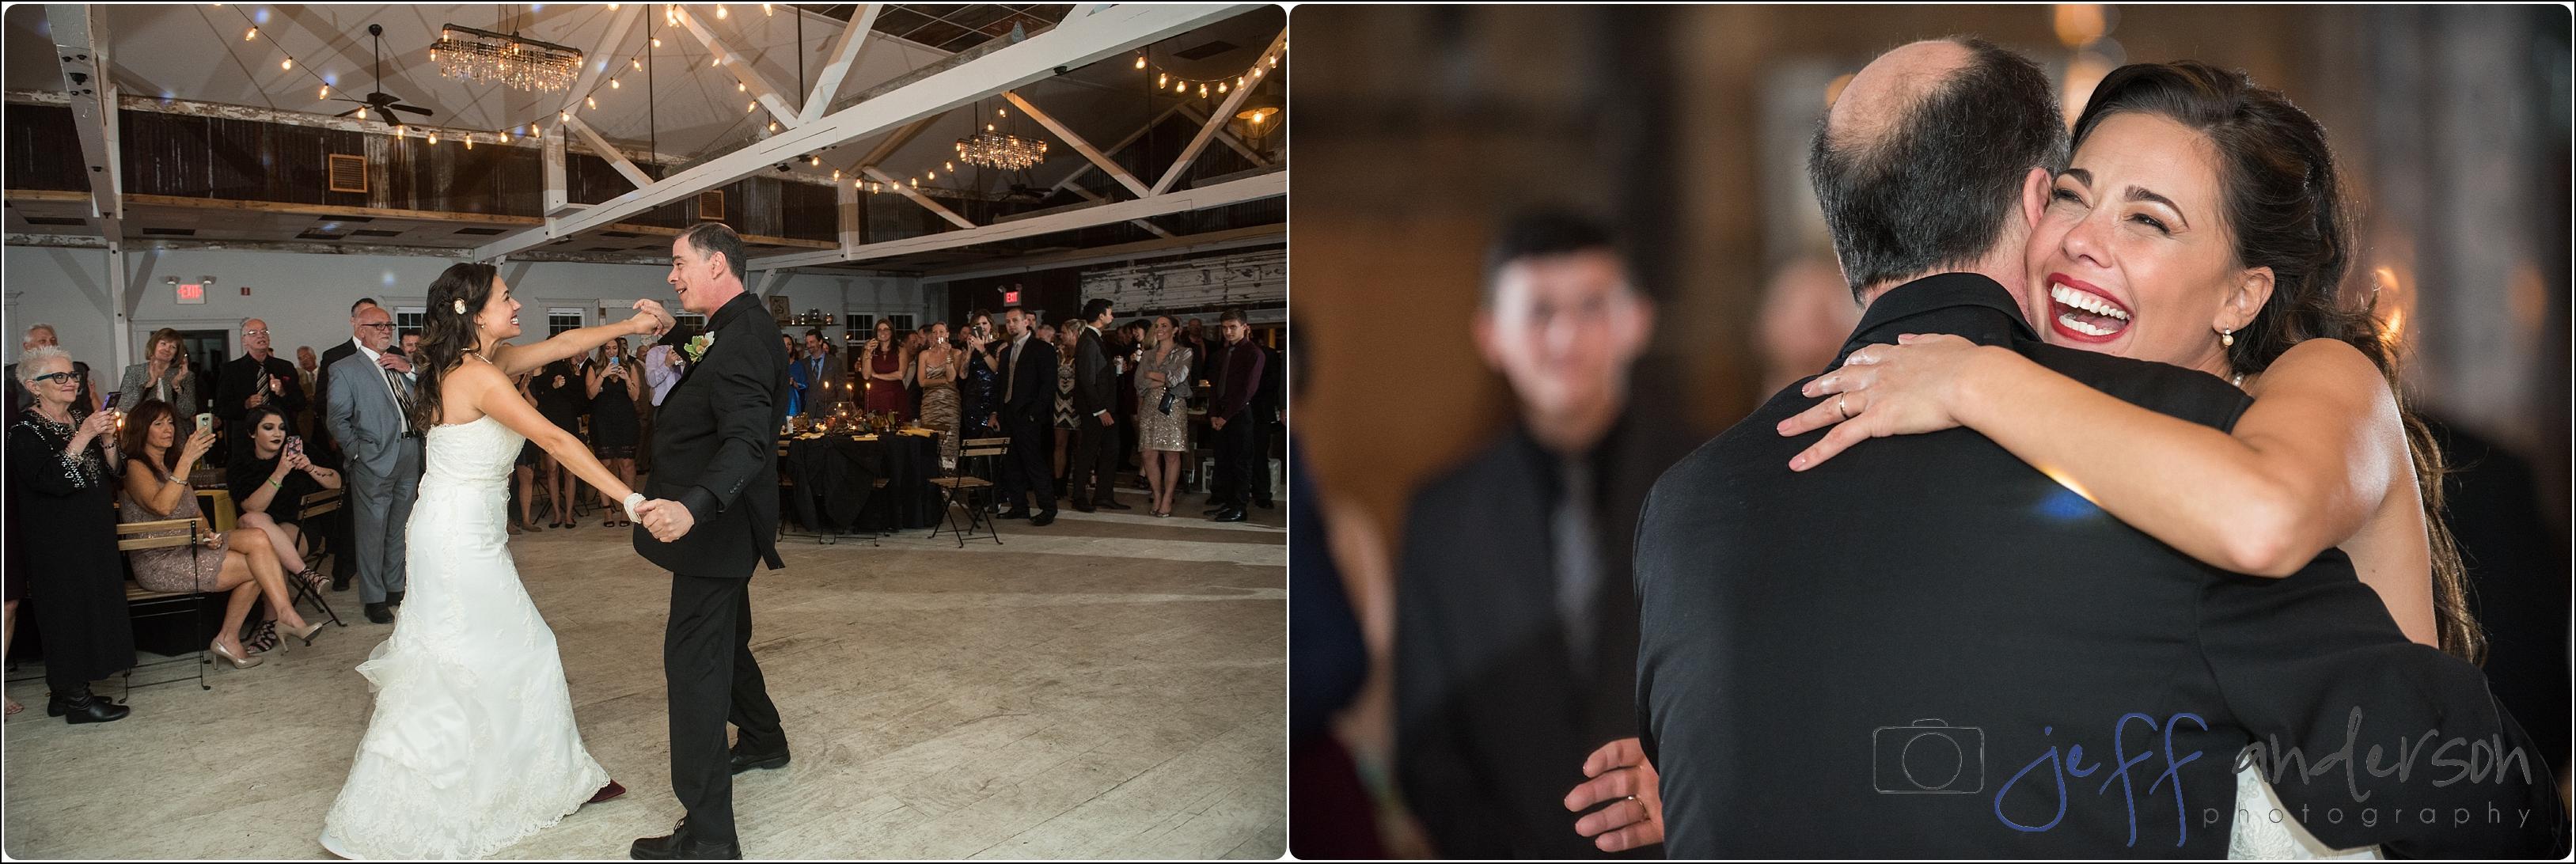 delaware county photographer,destination wedding photographer,everly tuckahoe nj,jeff anderson photography,media PA Photographer,nick & Chrissy,philadelphia wedding photographer,sea ilse nj,south jersey wedding photographer,wedding photography,